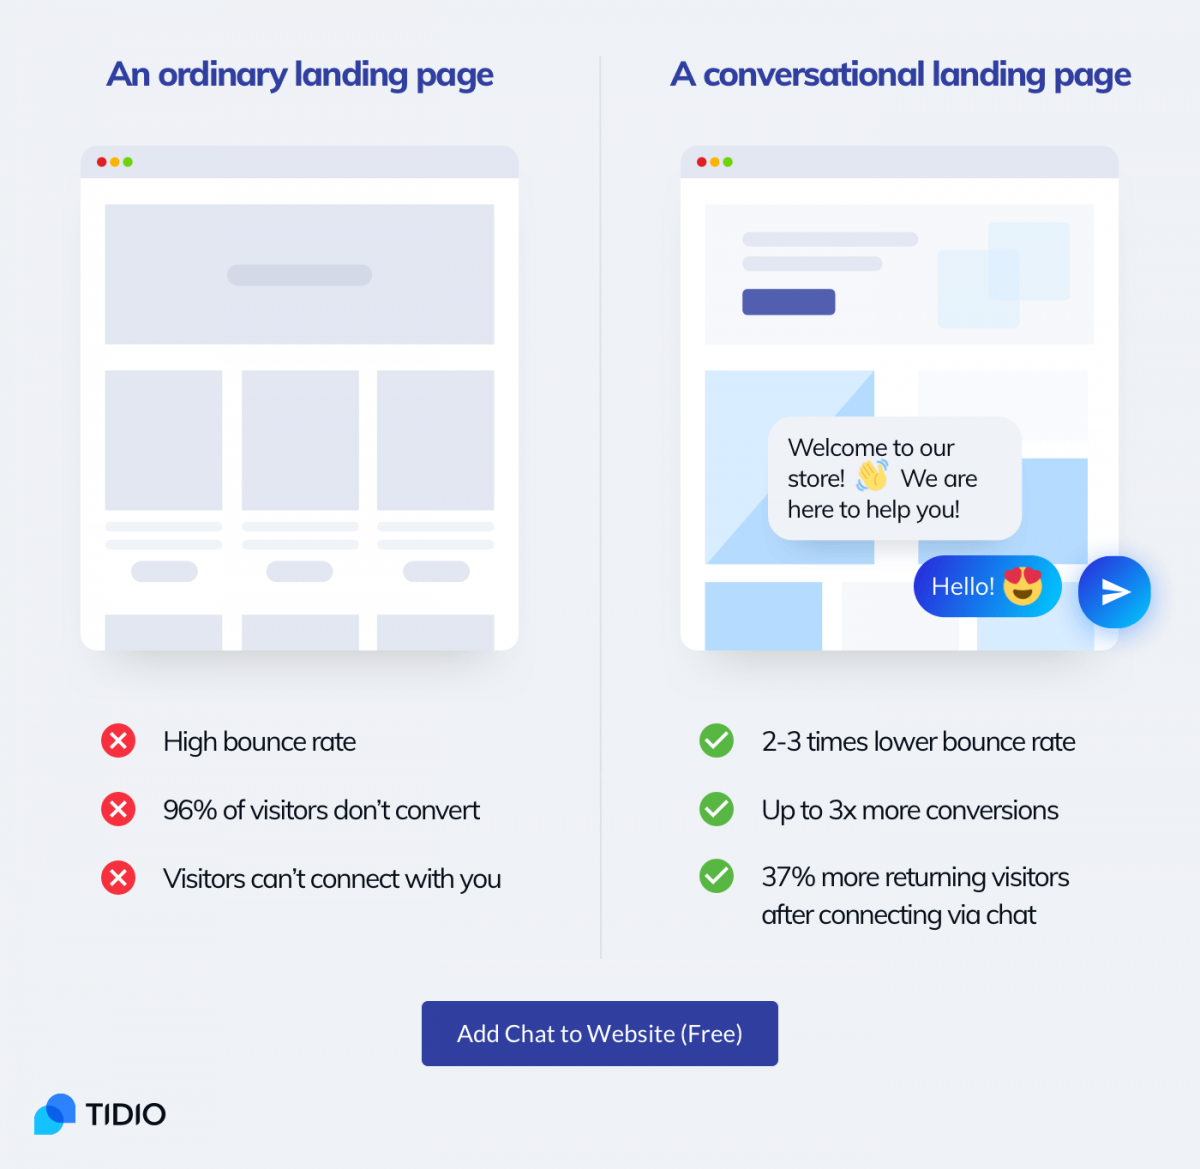 A regular landing page vs conversational landing page